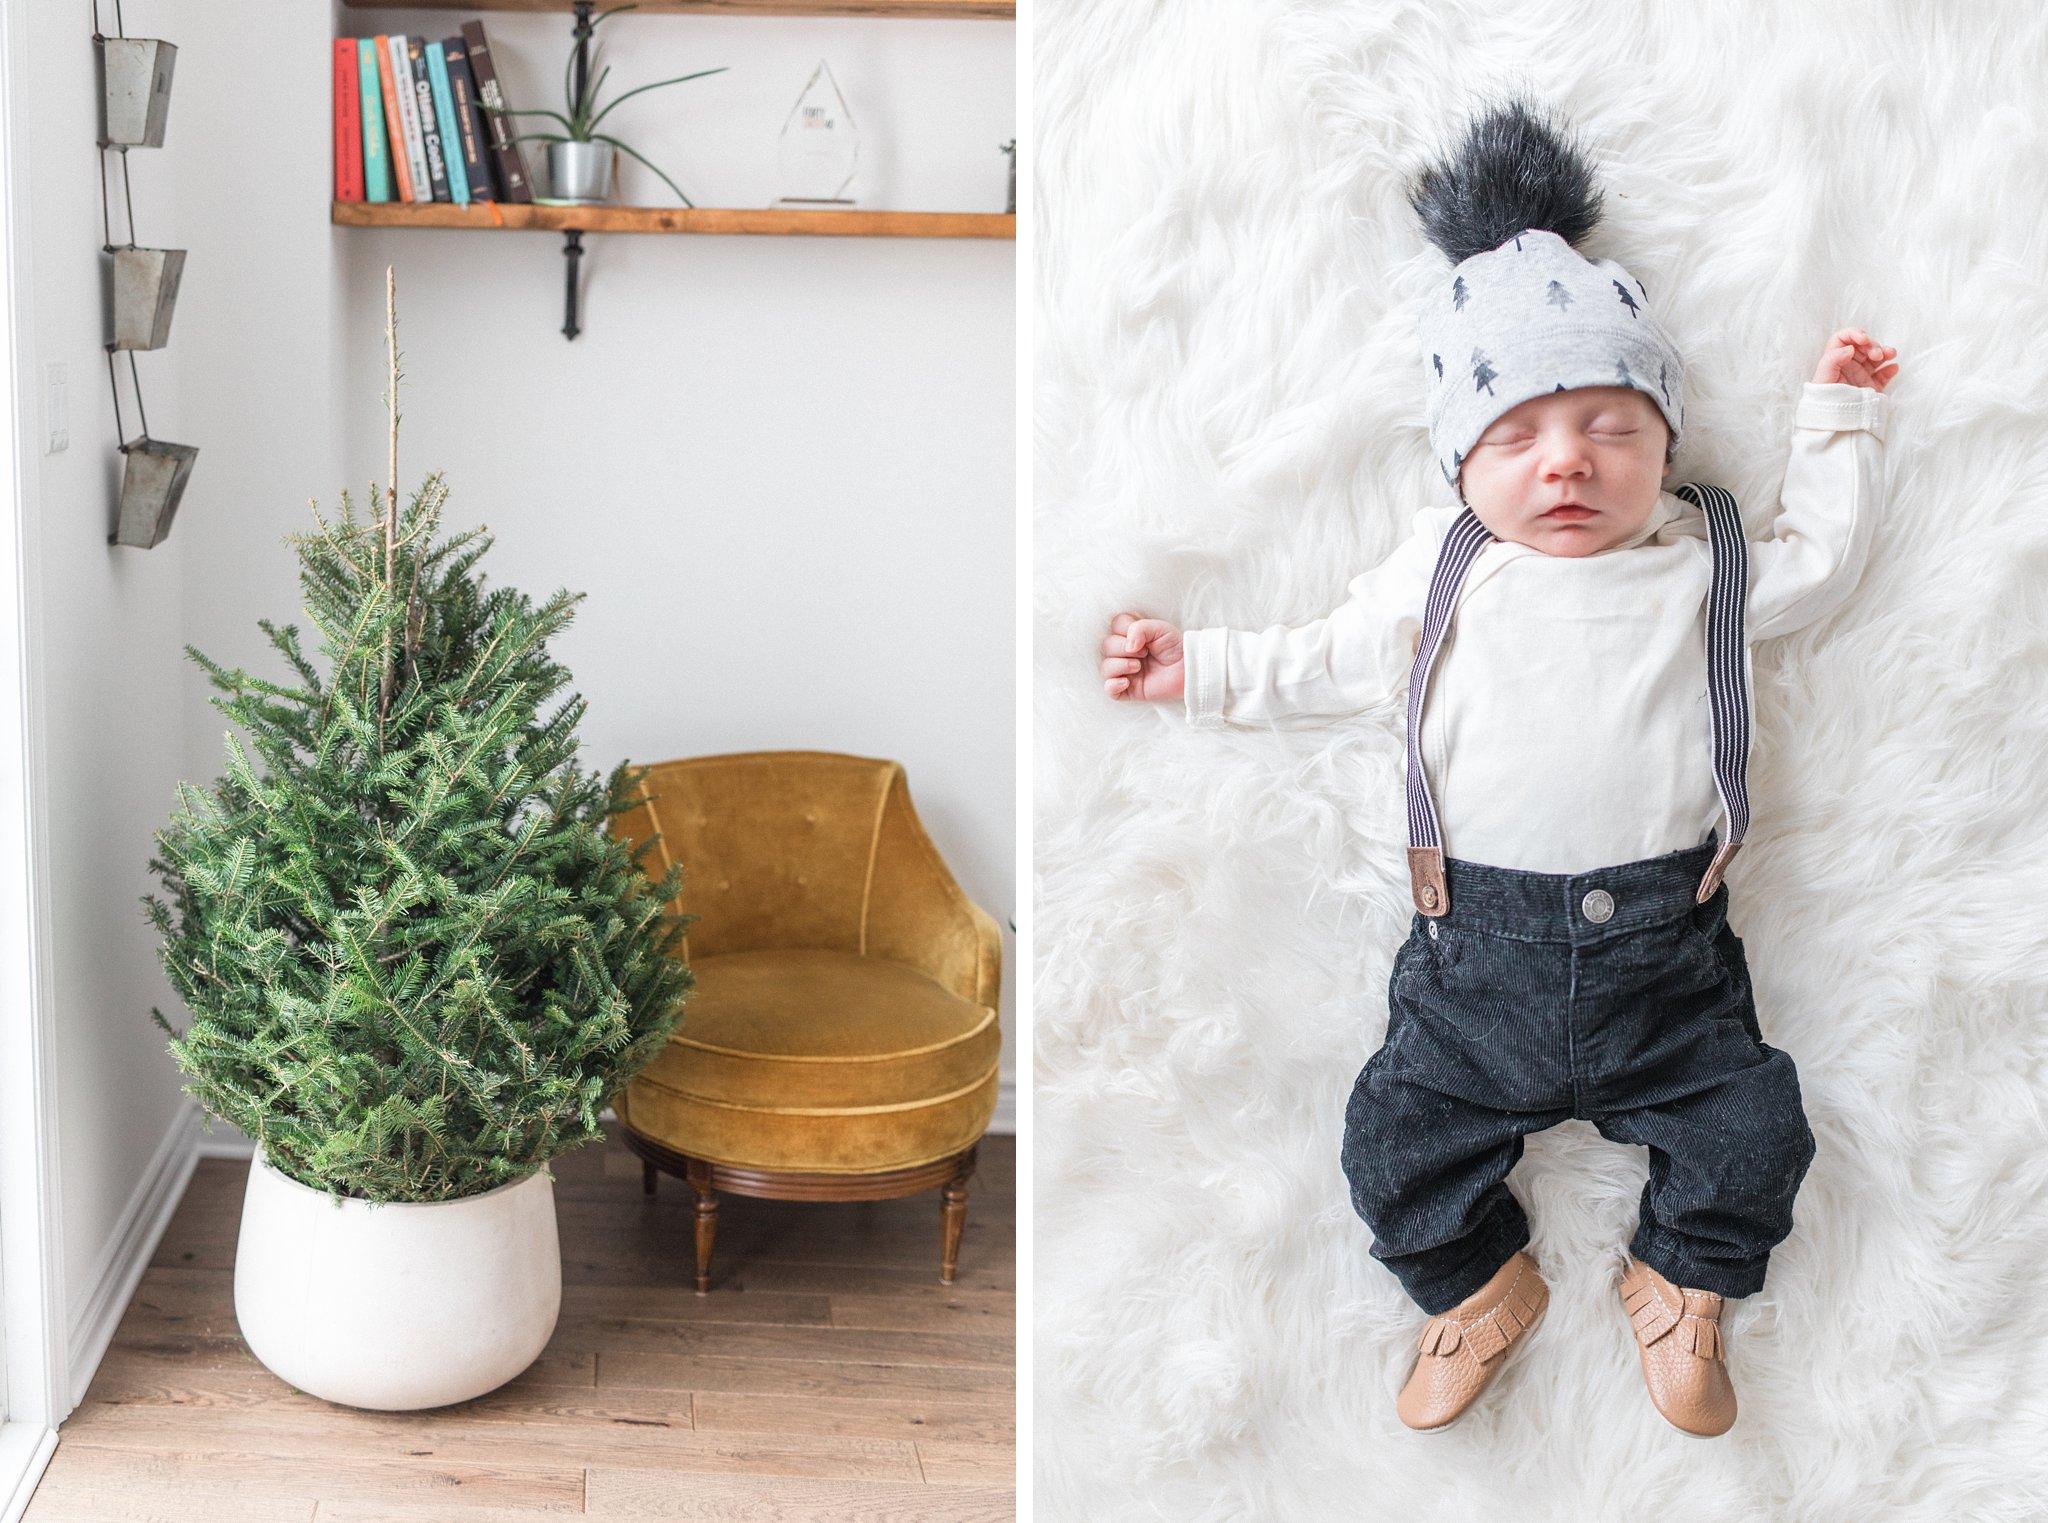 Suspender newborn outfit, Festive Newborn Lifestyle Photos During the Christmas Holidays